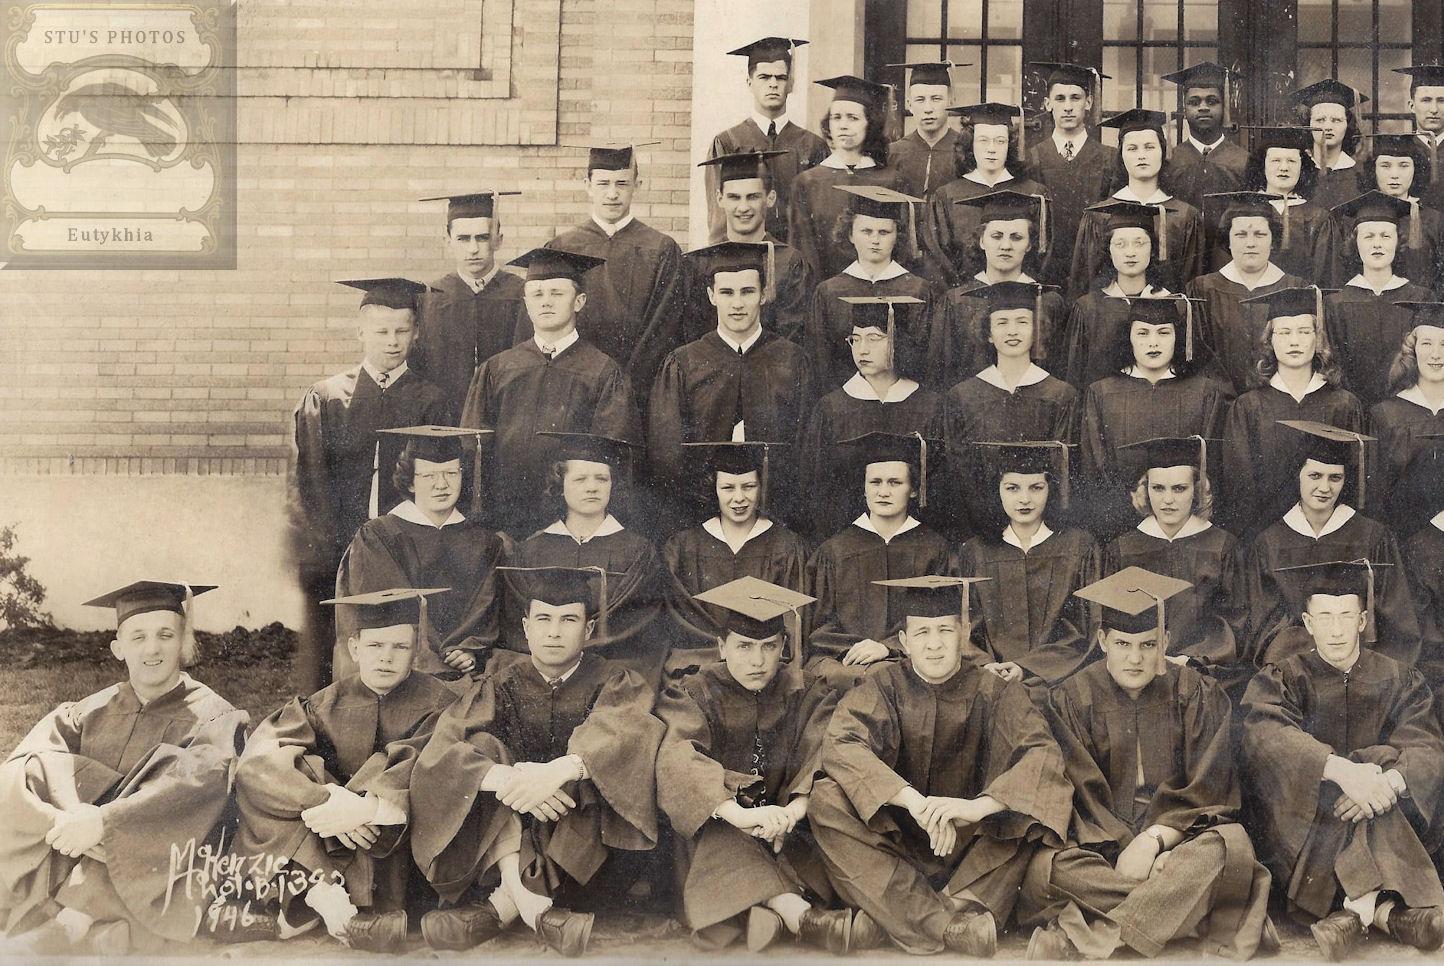 Morgan                                                           Park High                                                           School in                                                           Duluth, MN ~                                                           1946 Original                                                           Graduation                                                           Alumni